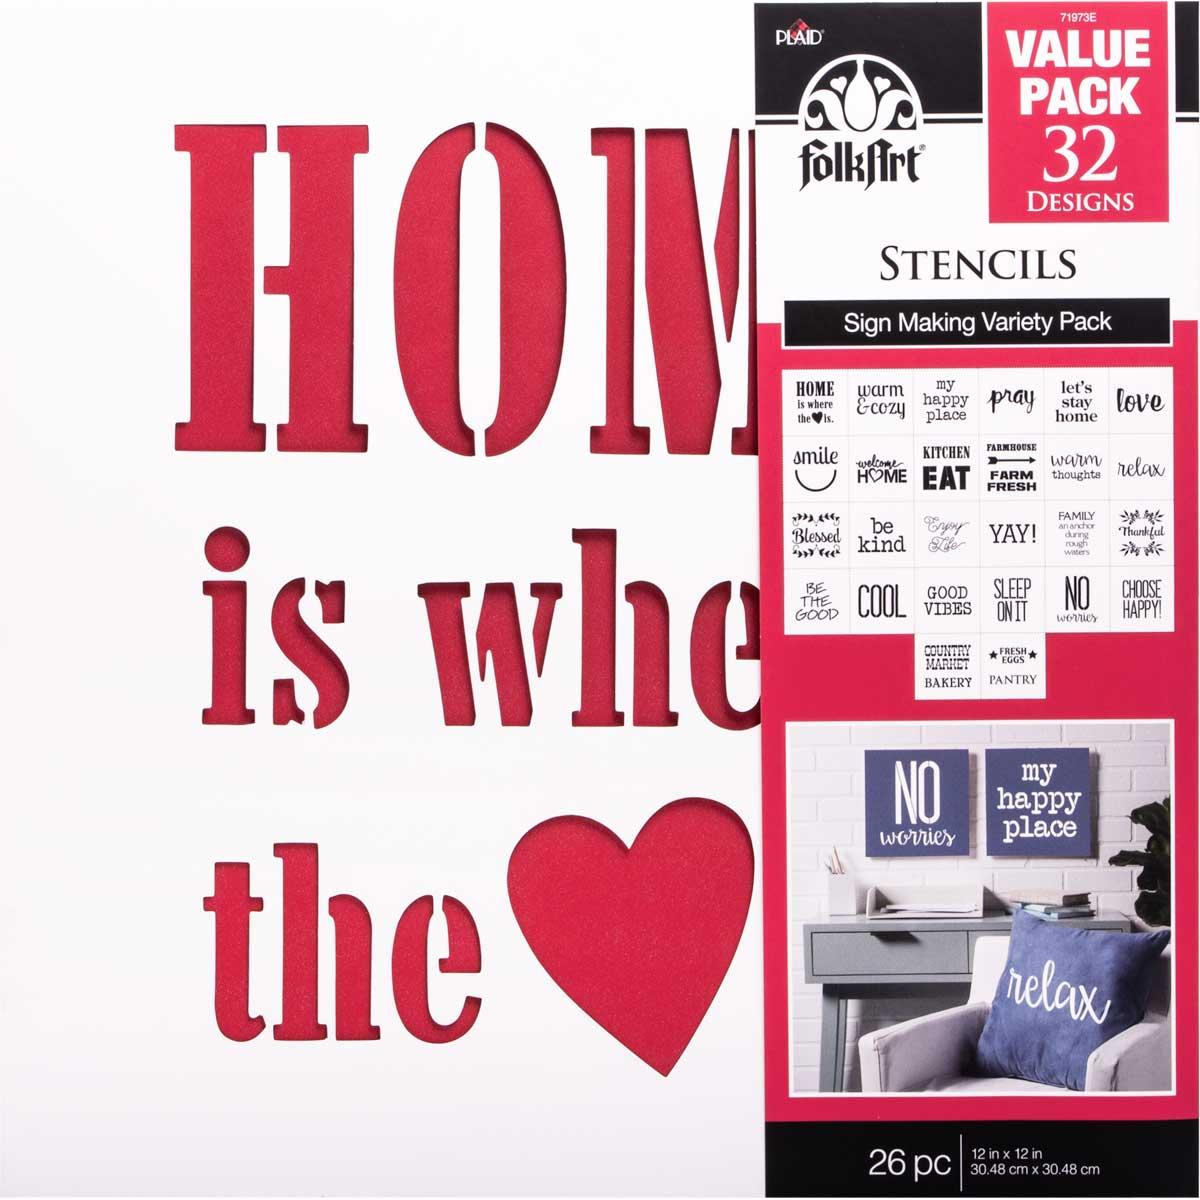 FolkArt ® Stencil Value Packs - Sign Making, 12